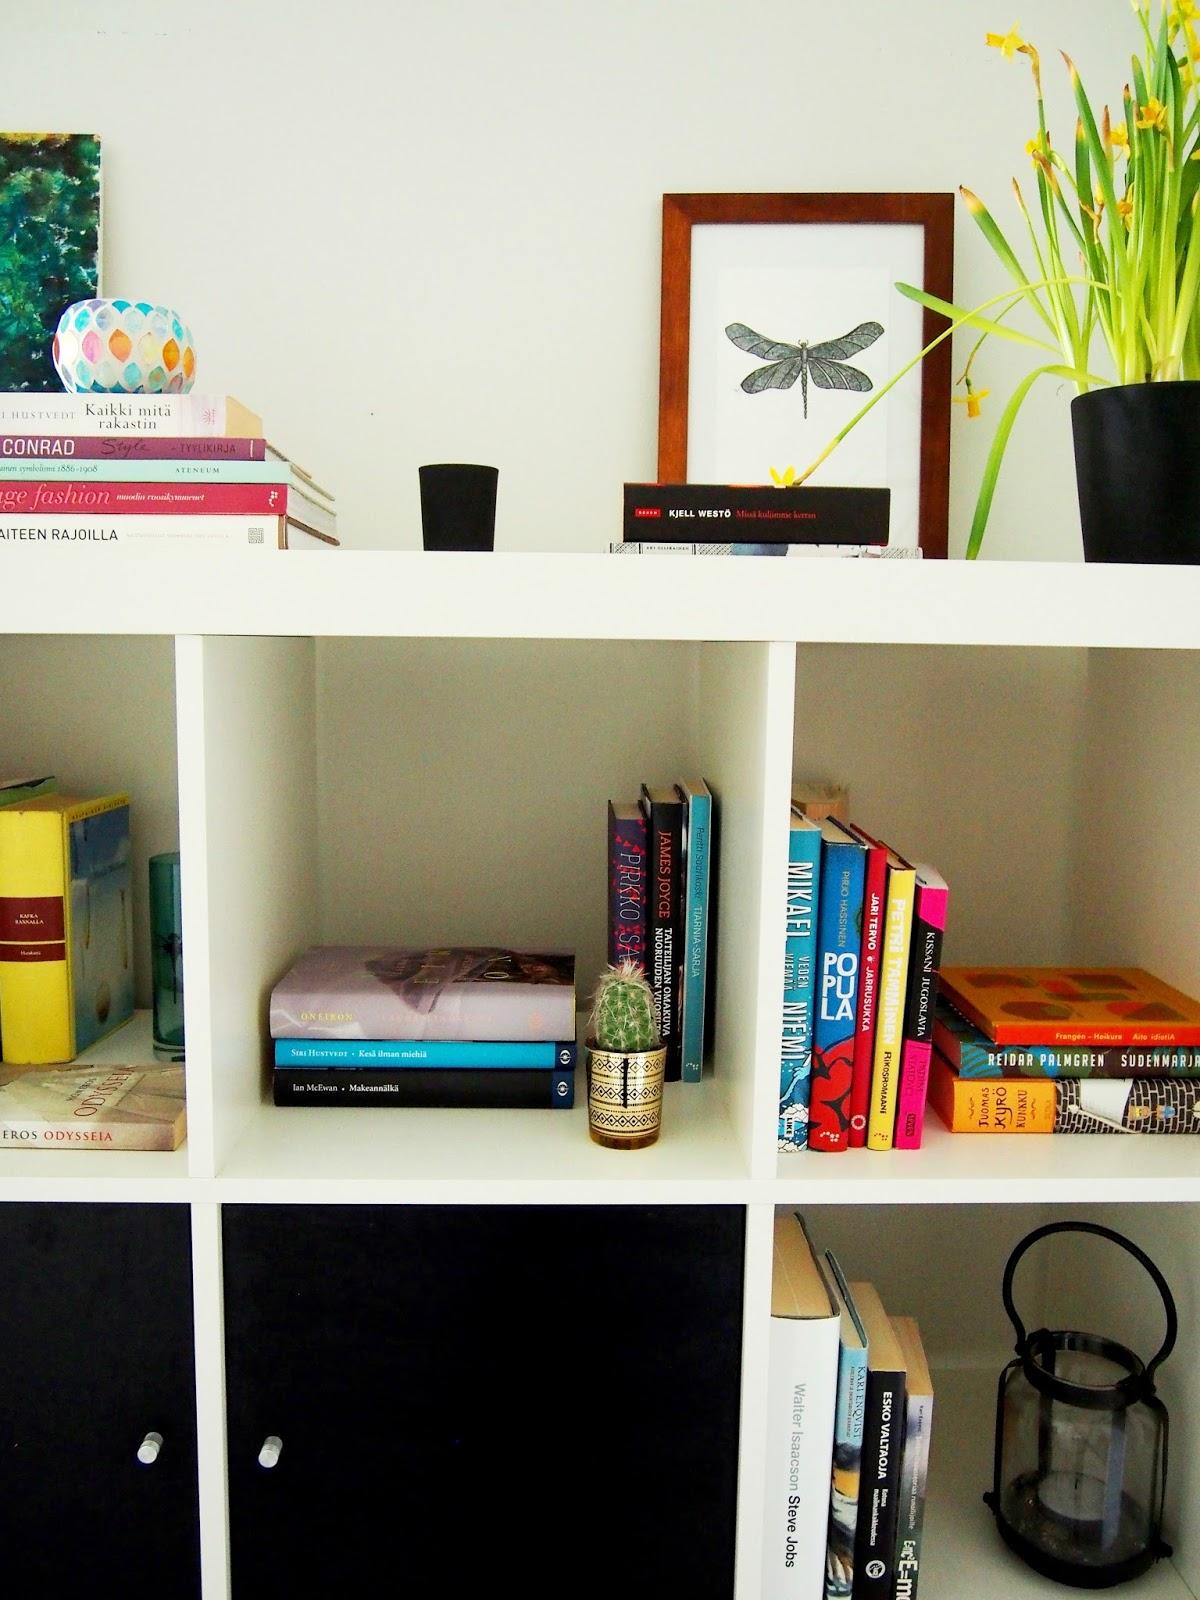 Book kirja hylly shelf shelves art style Lauren Conrad siri hustvedt candle